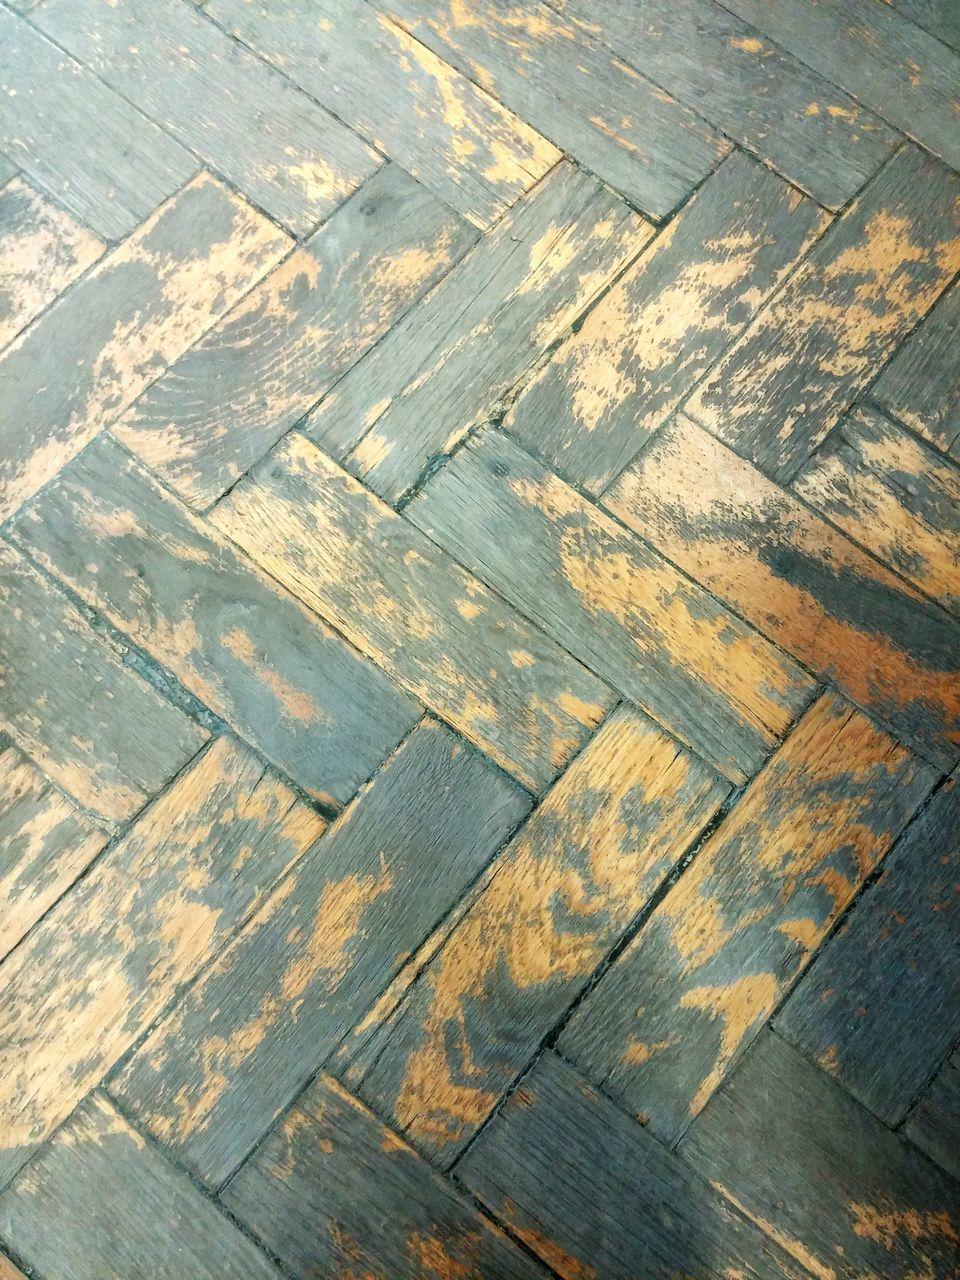 backgrounds, flooring, pattern, wood - material, hardwood floor, full frame, textured, wood grain, no people, hardwood, indoors, nature, wood paneling, close-up, day